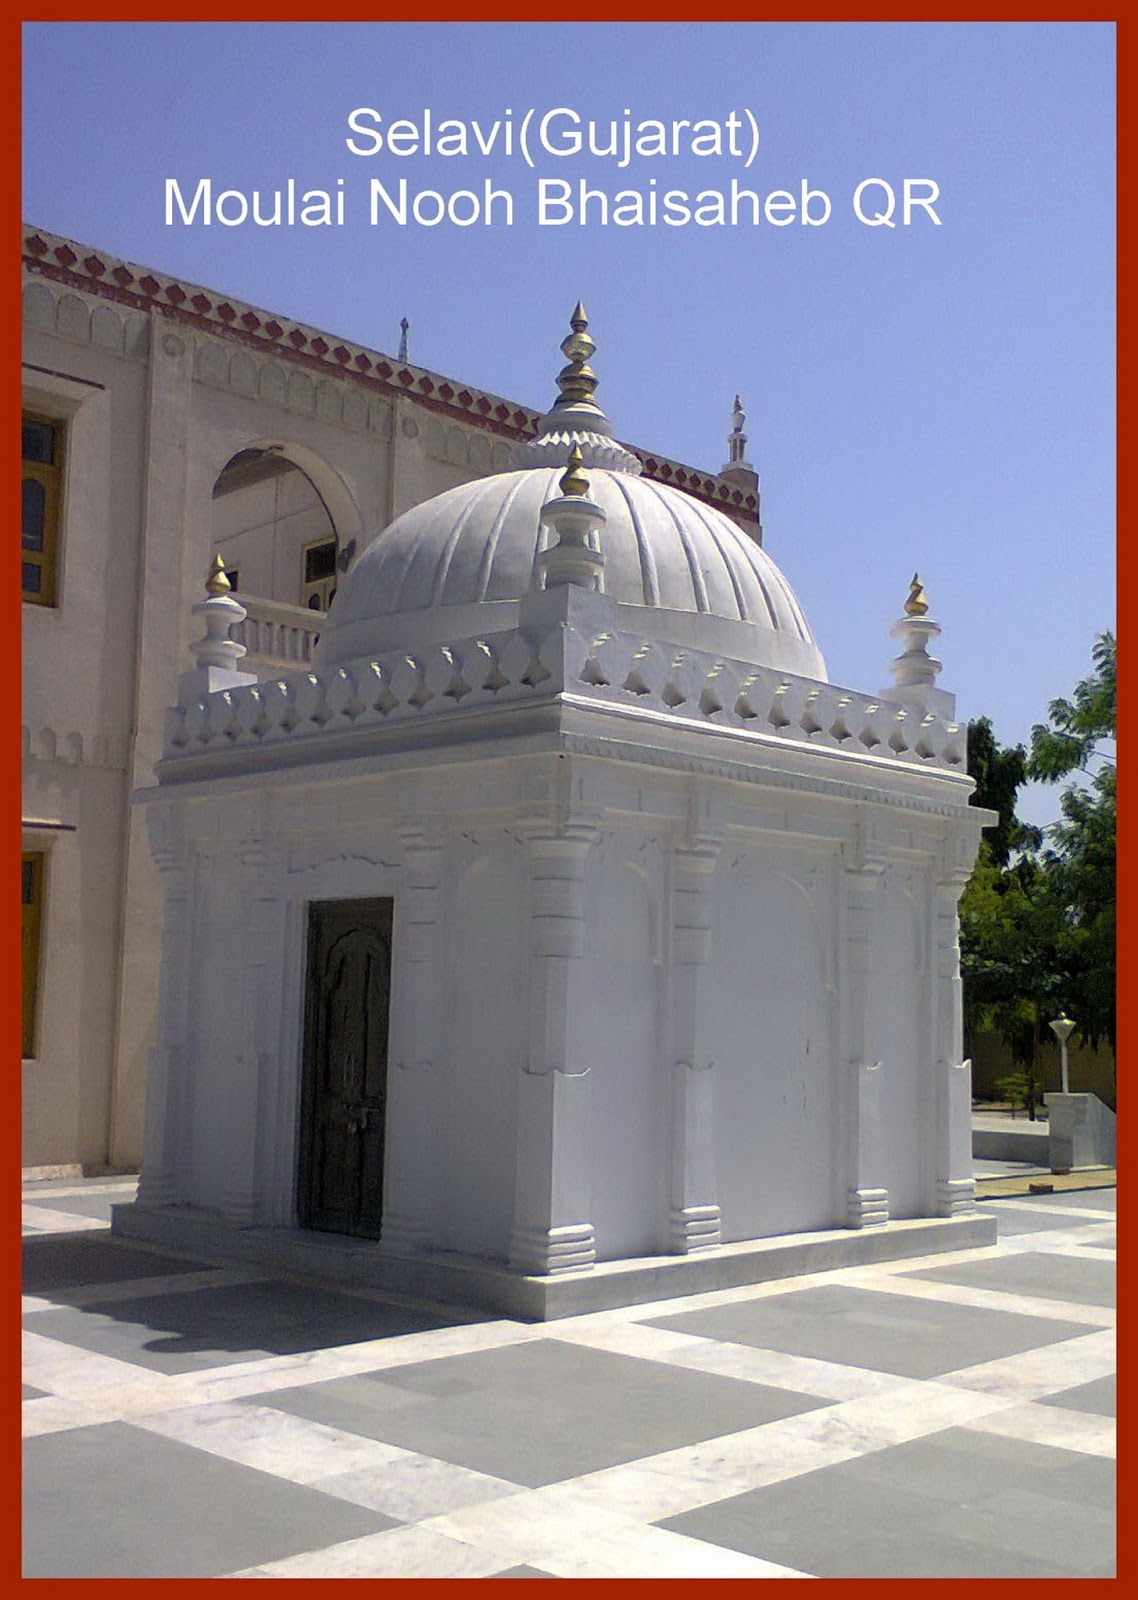 Selavi Ziyarat-Gujarat